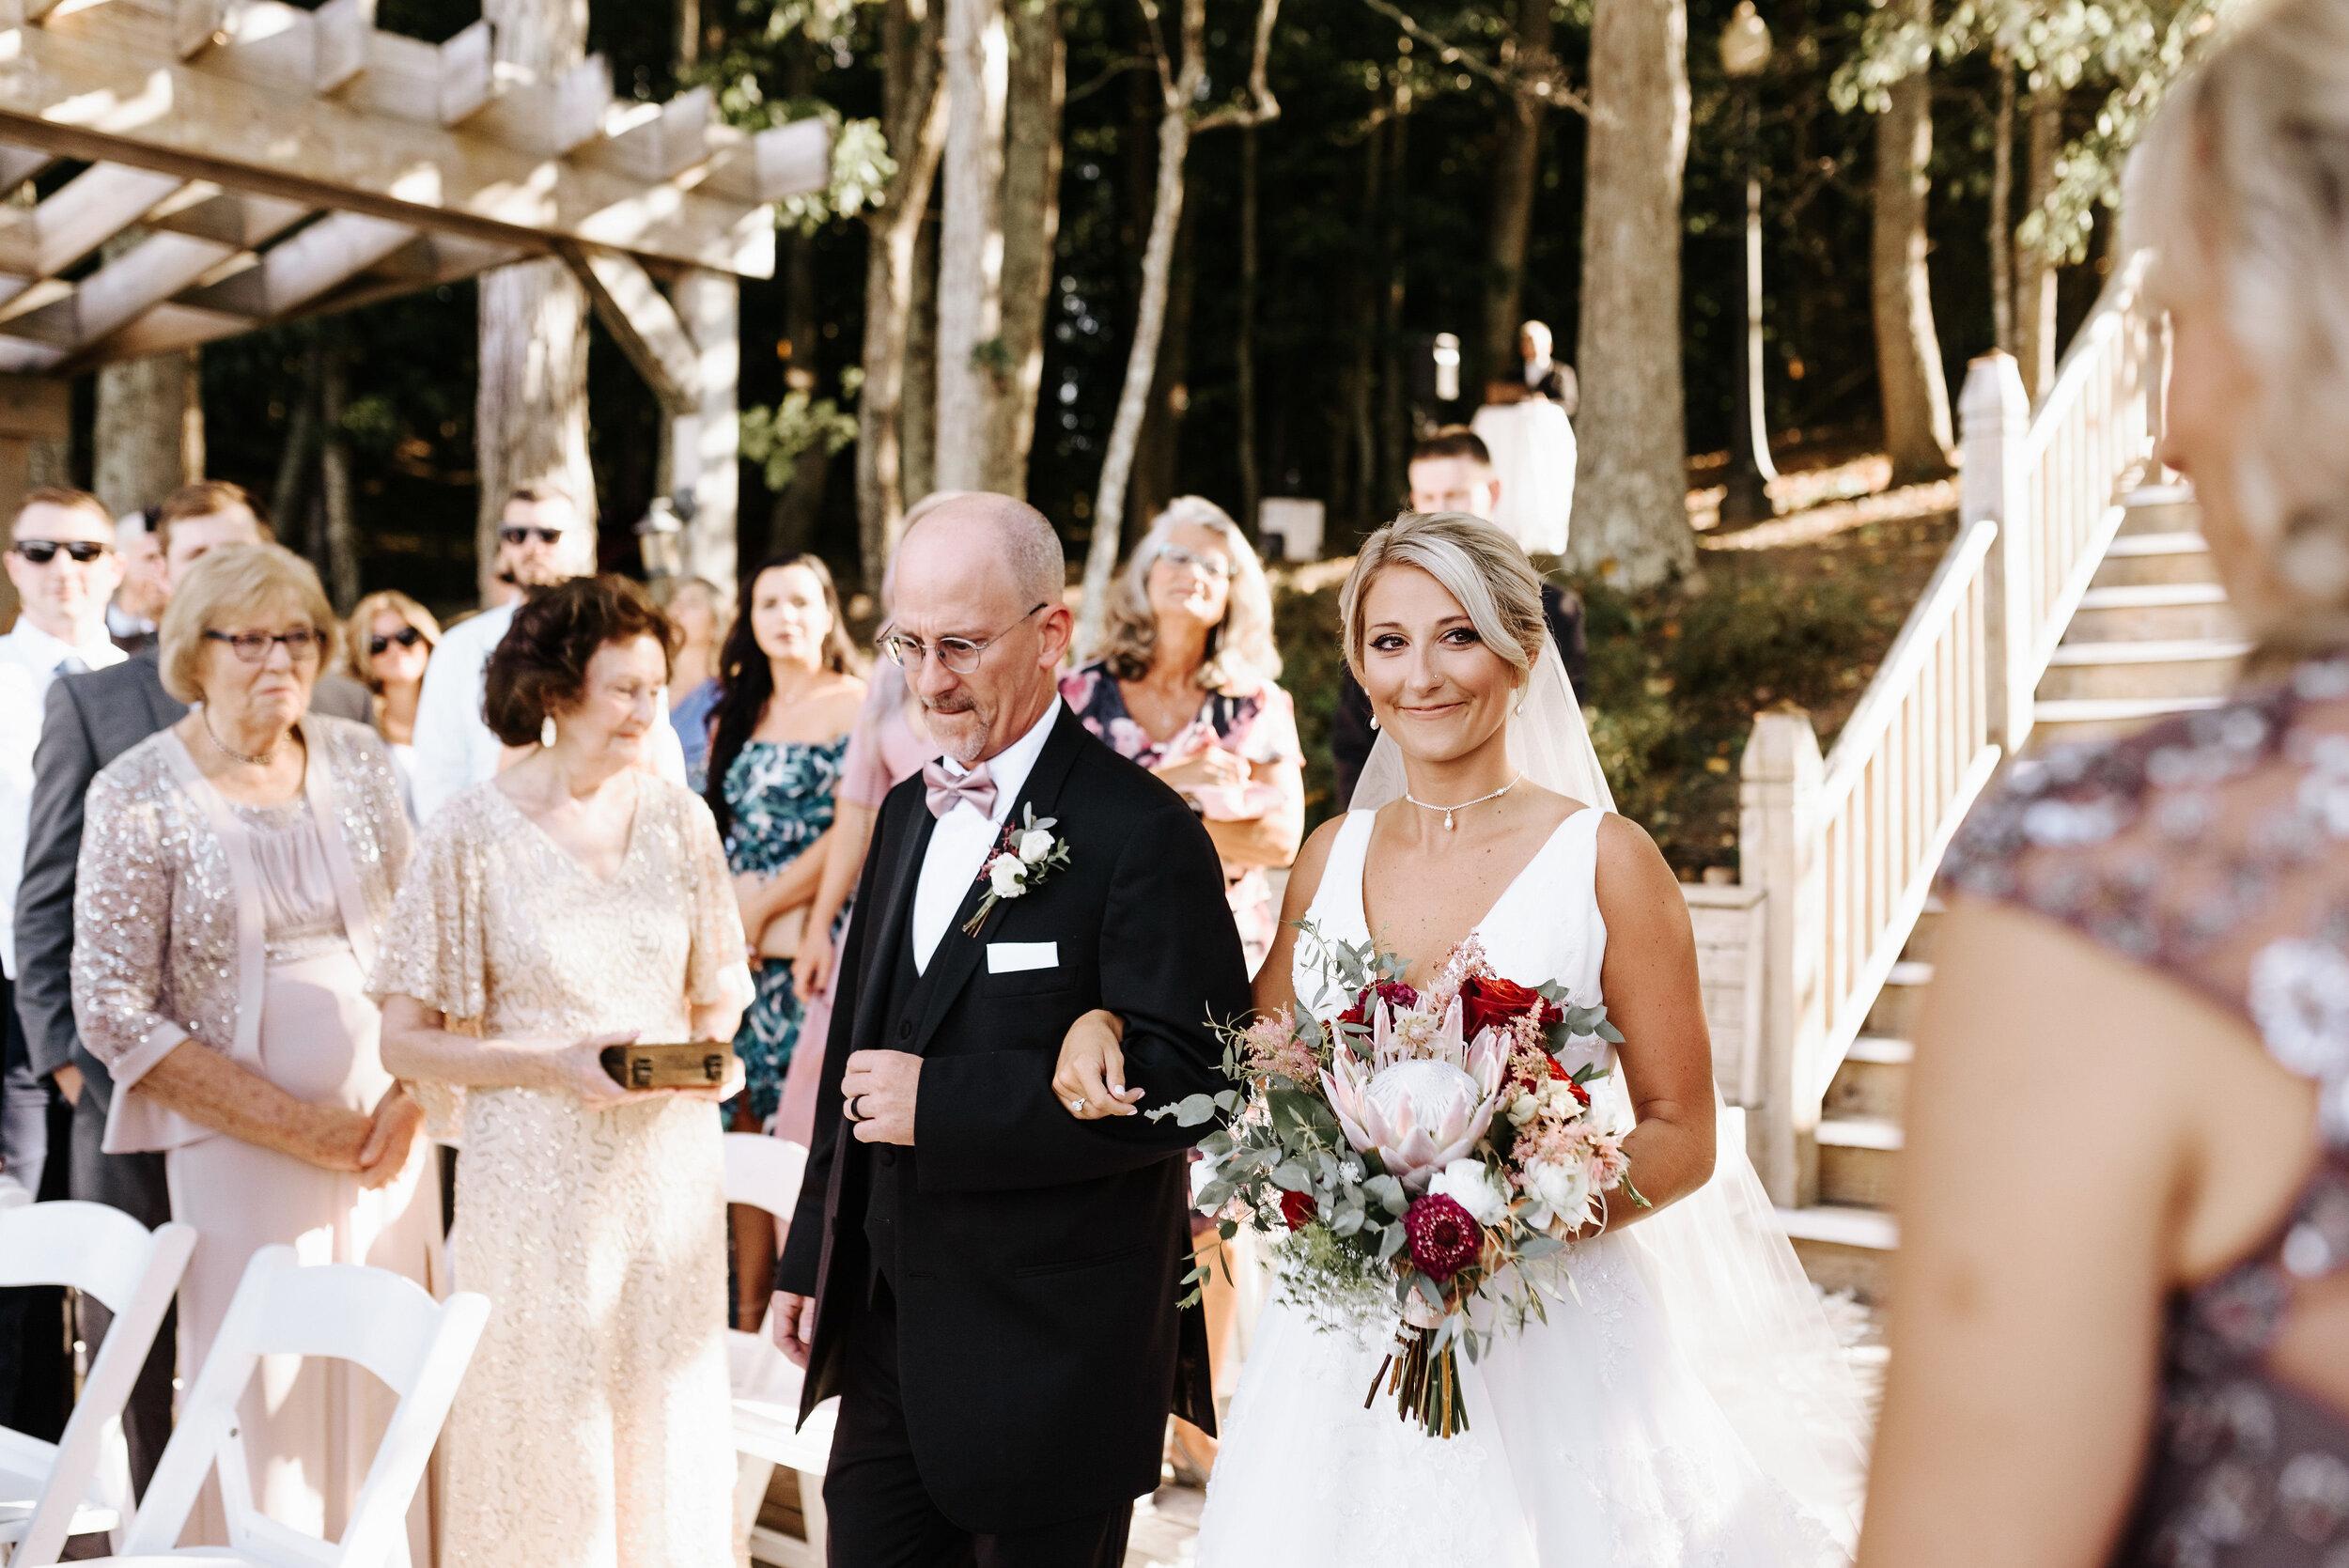 Emily_Mike_Wedding_Celebrations_at_the_Reservoir_Pool_Pavilion_Richmond_Virginia_Wedding_Photographer_Photography_by_V_44.jpg